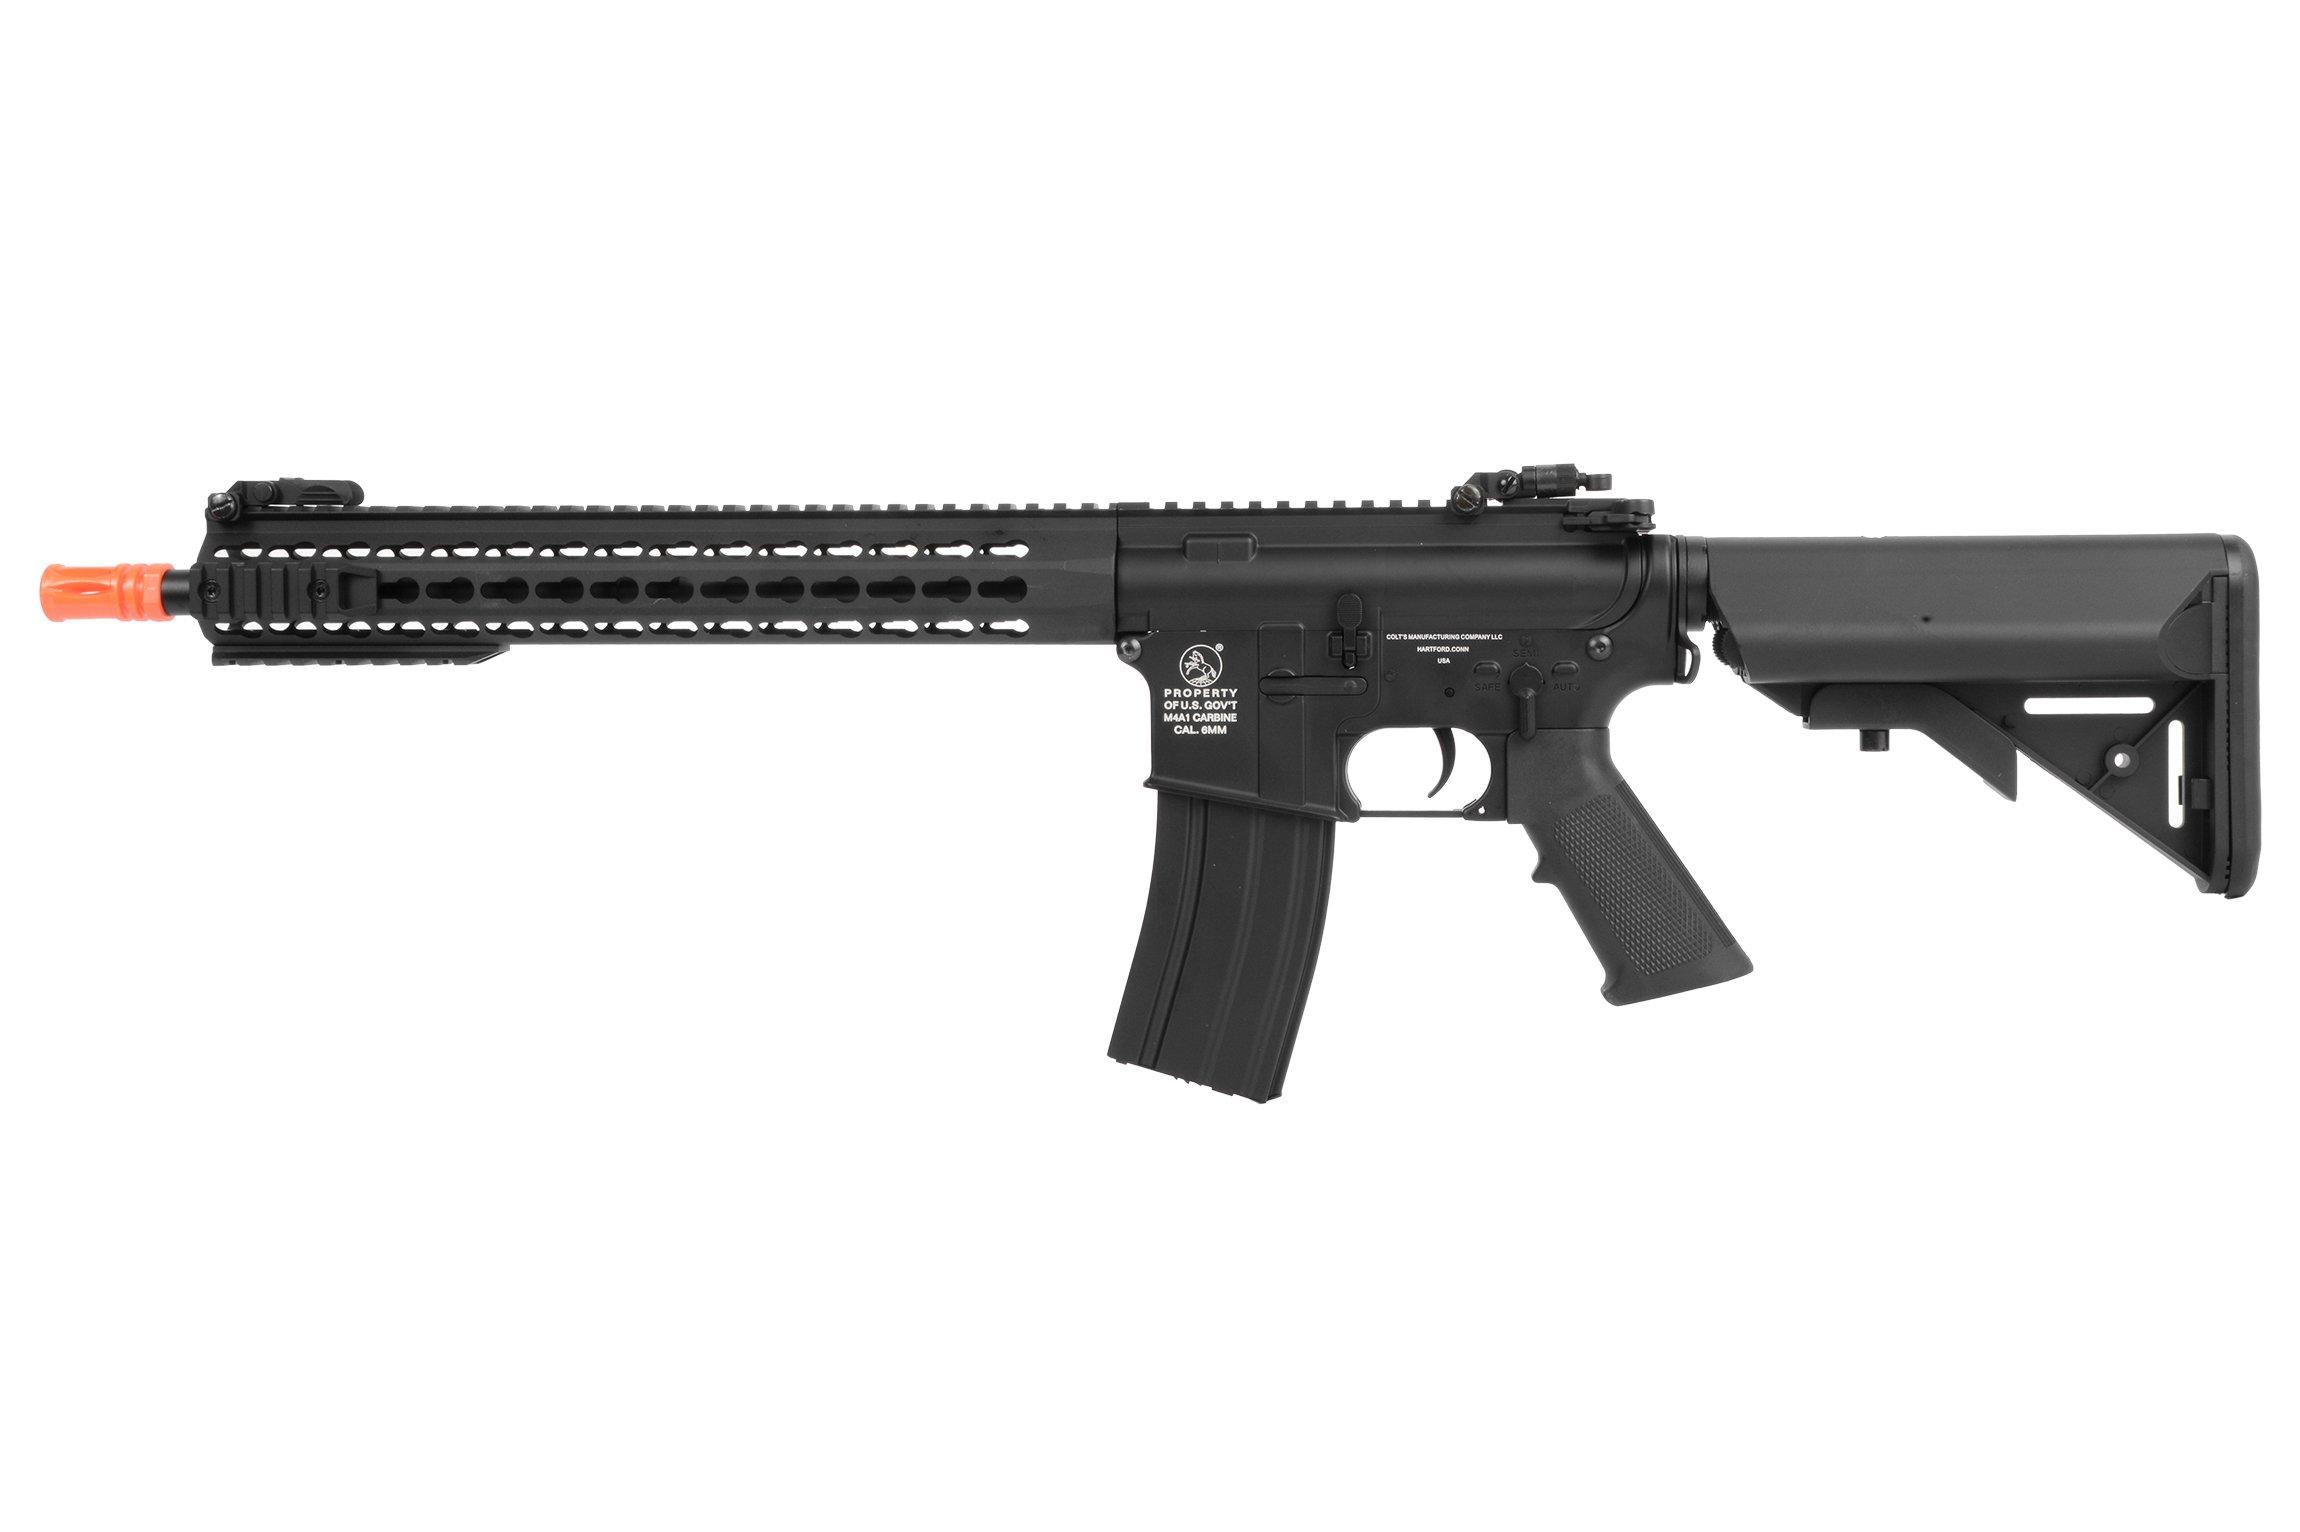 Pistola de Airsoft eléctrica automática COLT M4 KeyMod de Soft Air